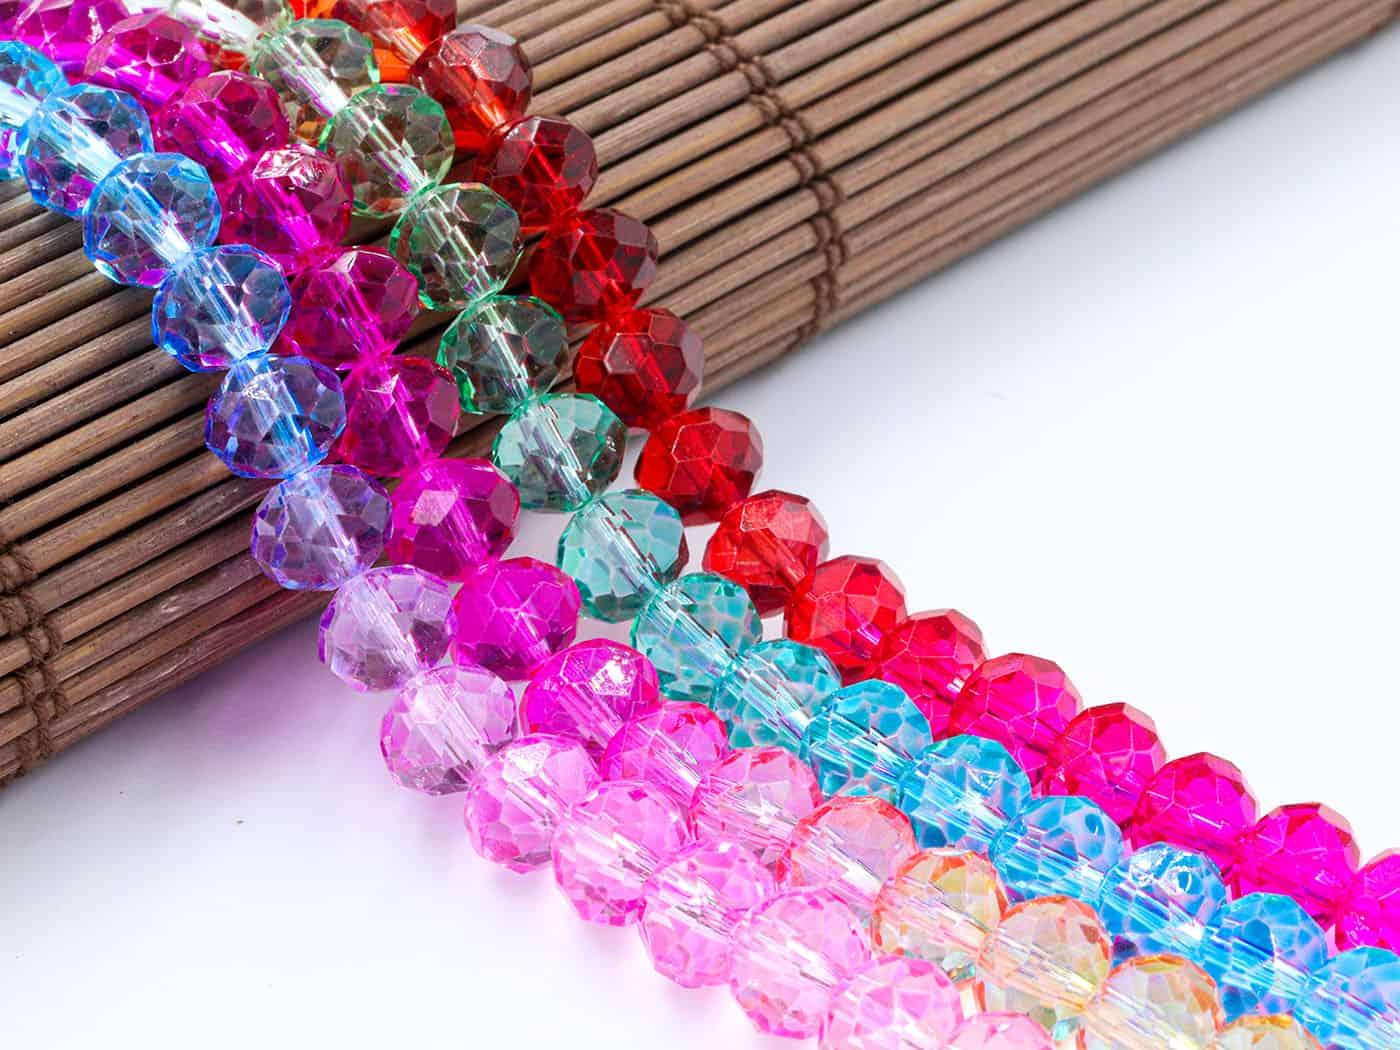 Cristal de Vidro Tie Dye Intense 8mm - 60 cristais - CV516  - ArtStones